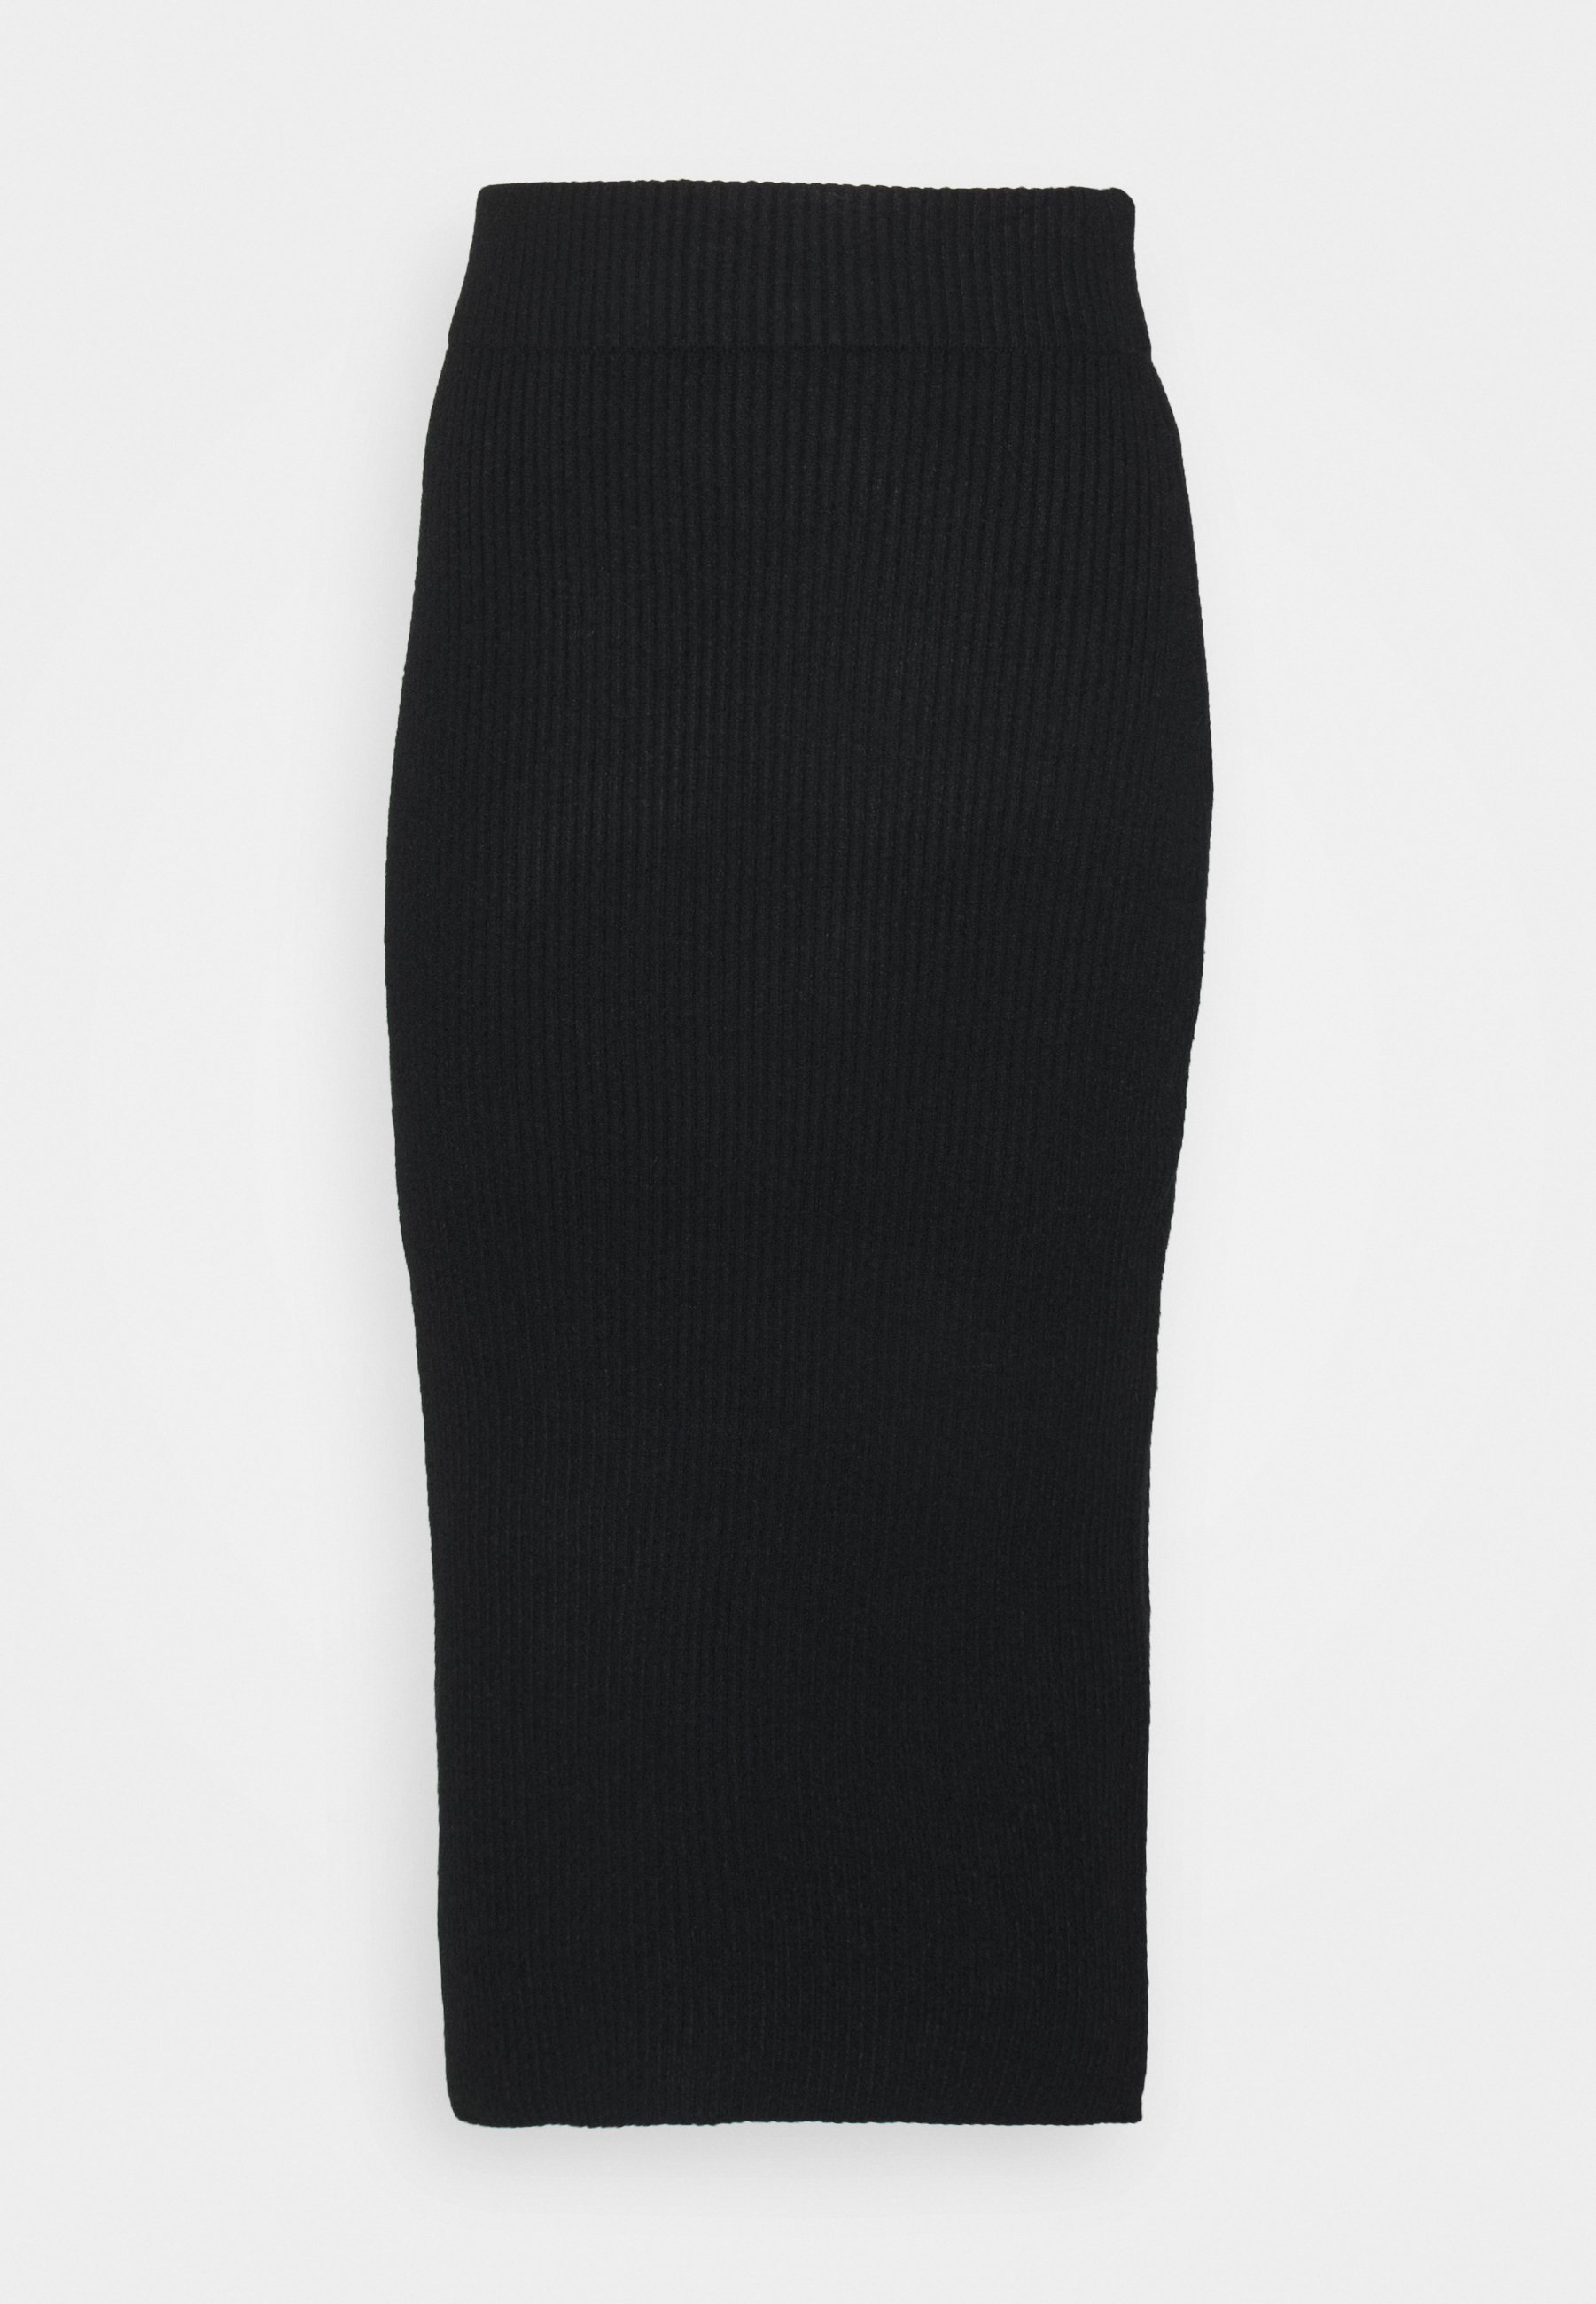 Femme VIRIL PENCIL SKIRT - Jupe crayon